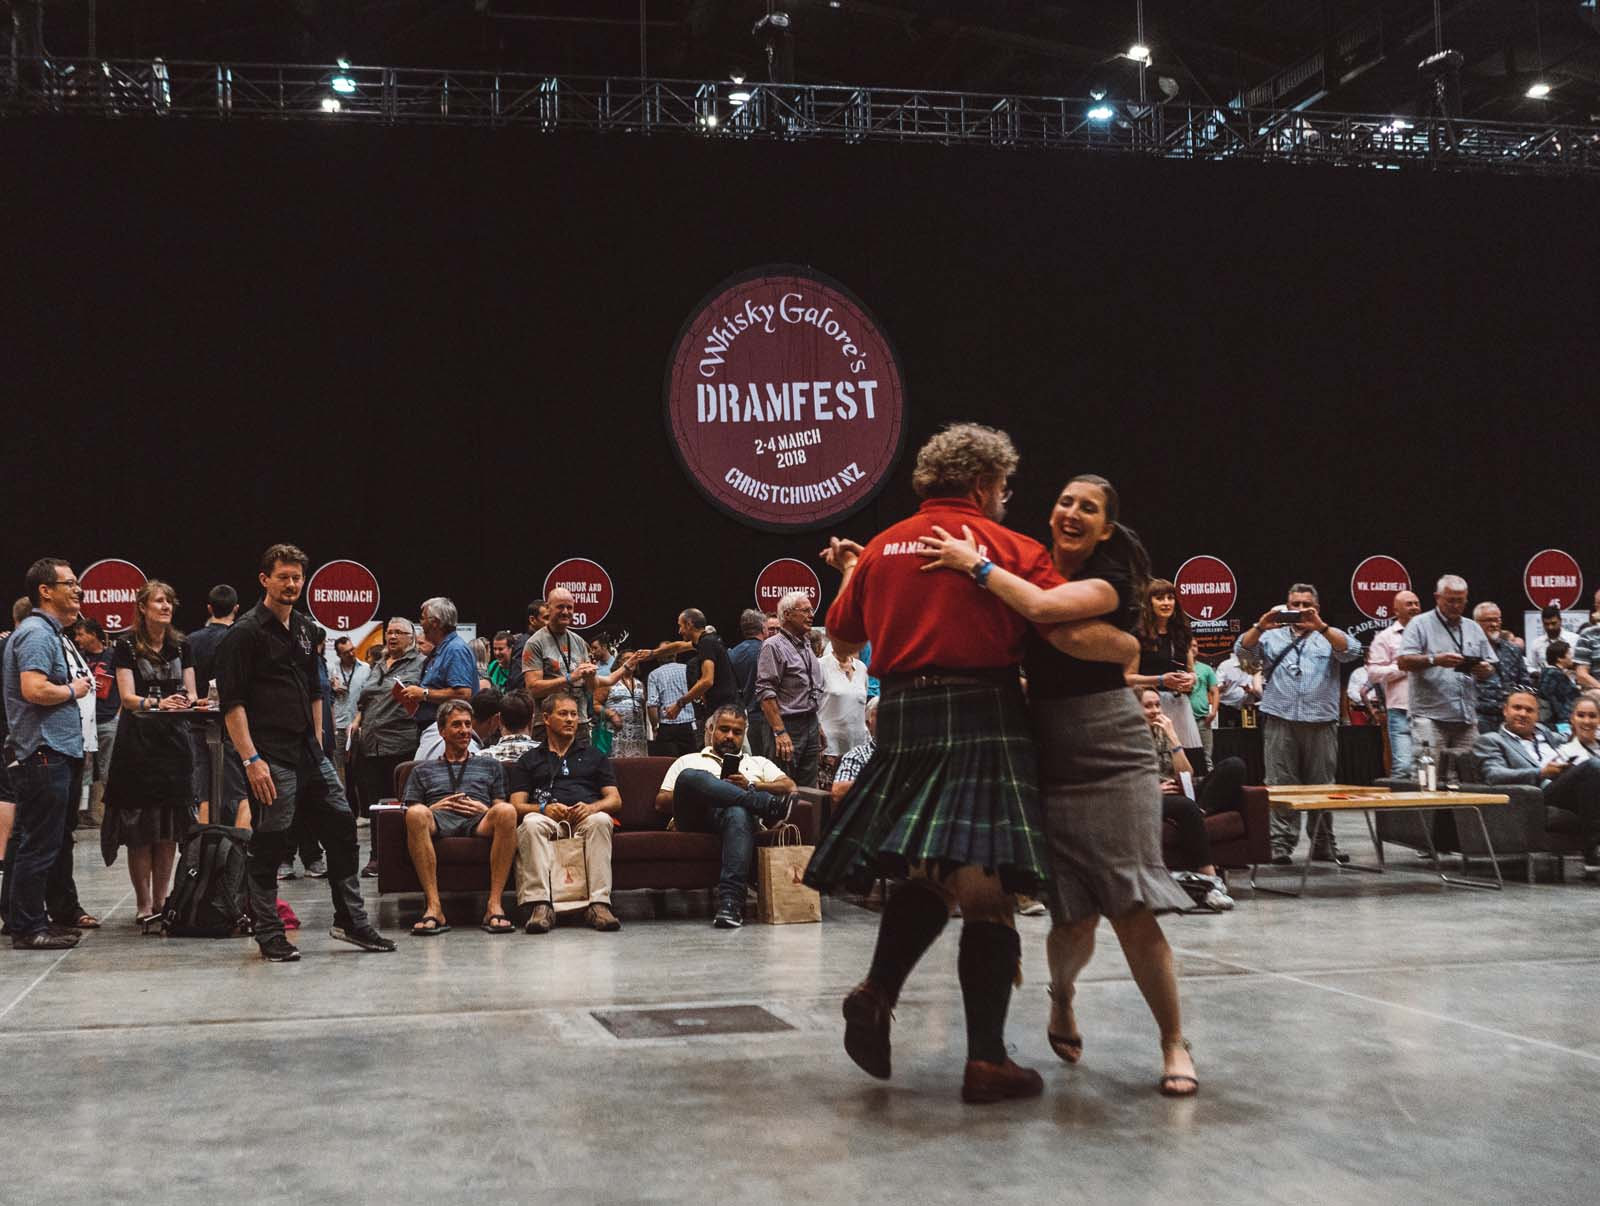 Dramfest 2018 for Whisky Galore-79.jpg